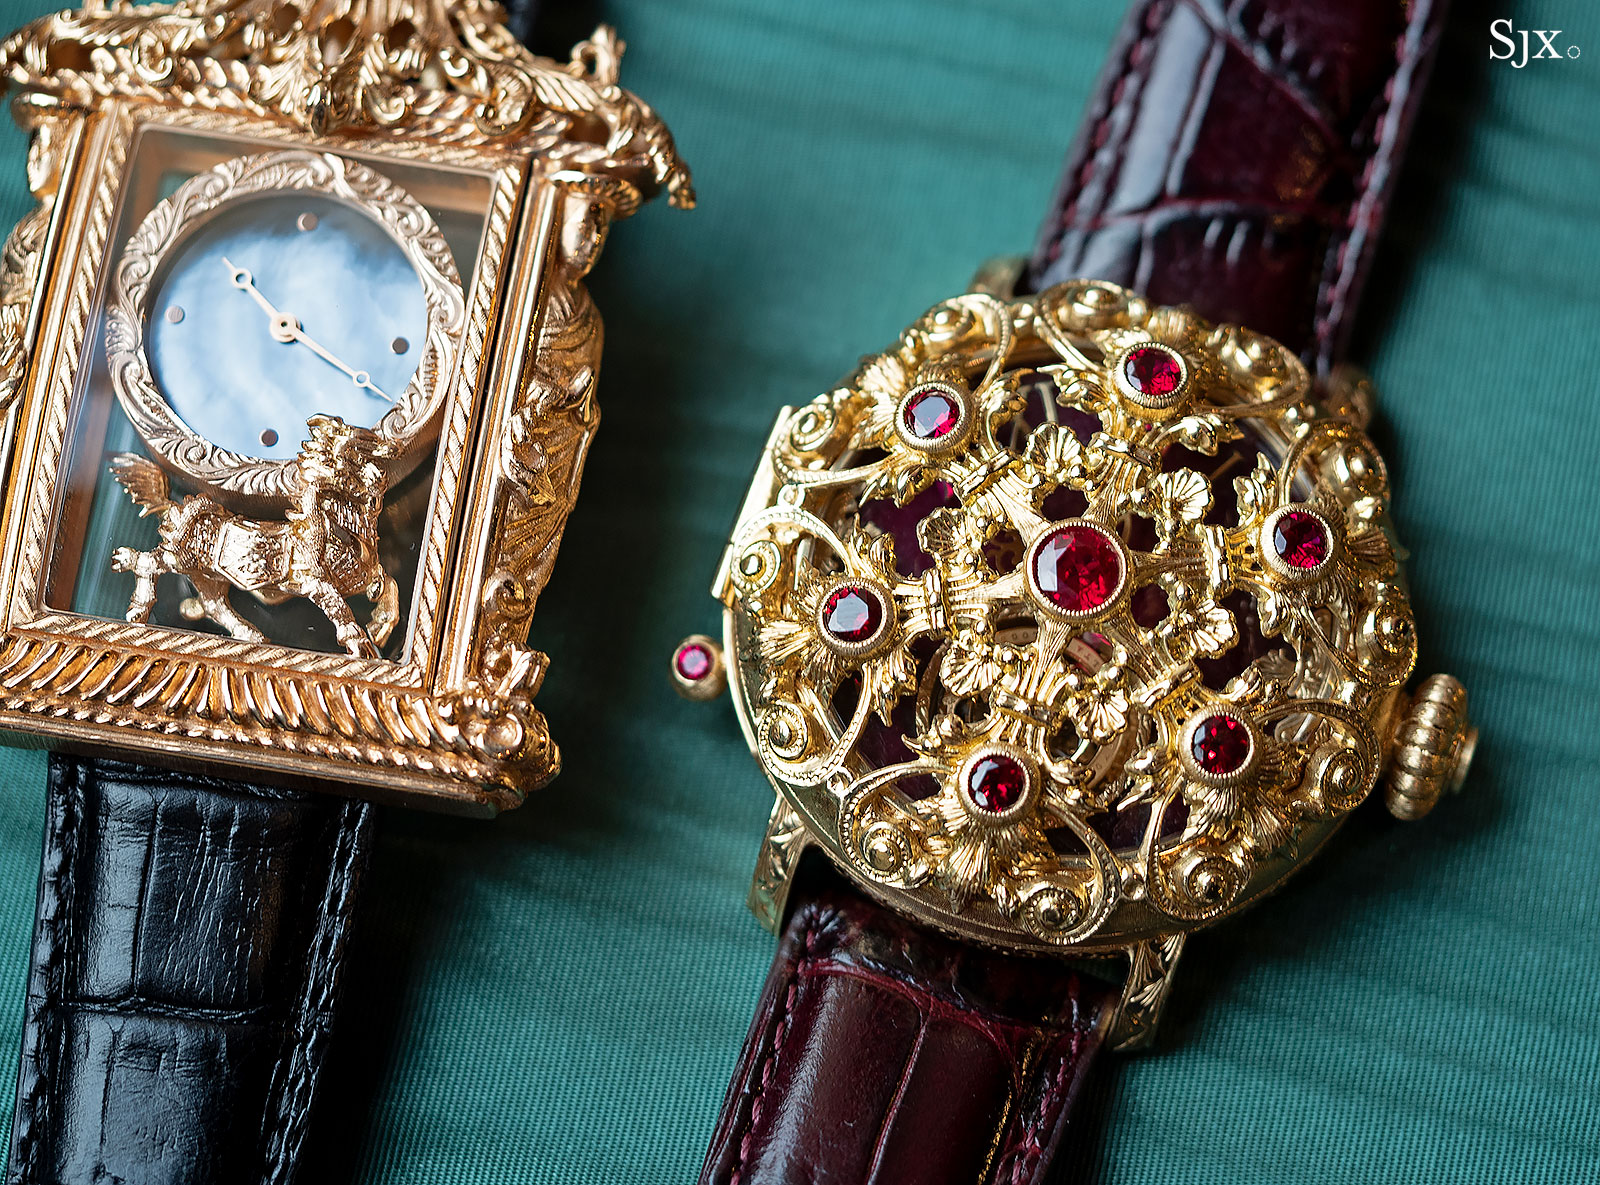 Dolce Gabbana Alta Orologeria watch